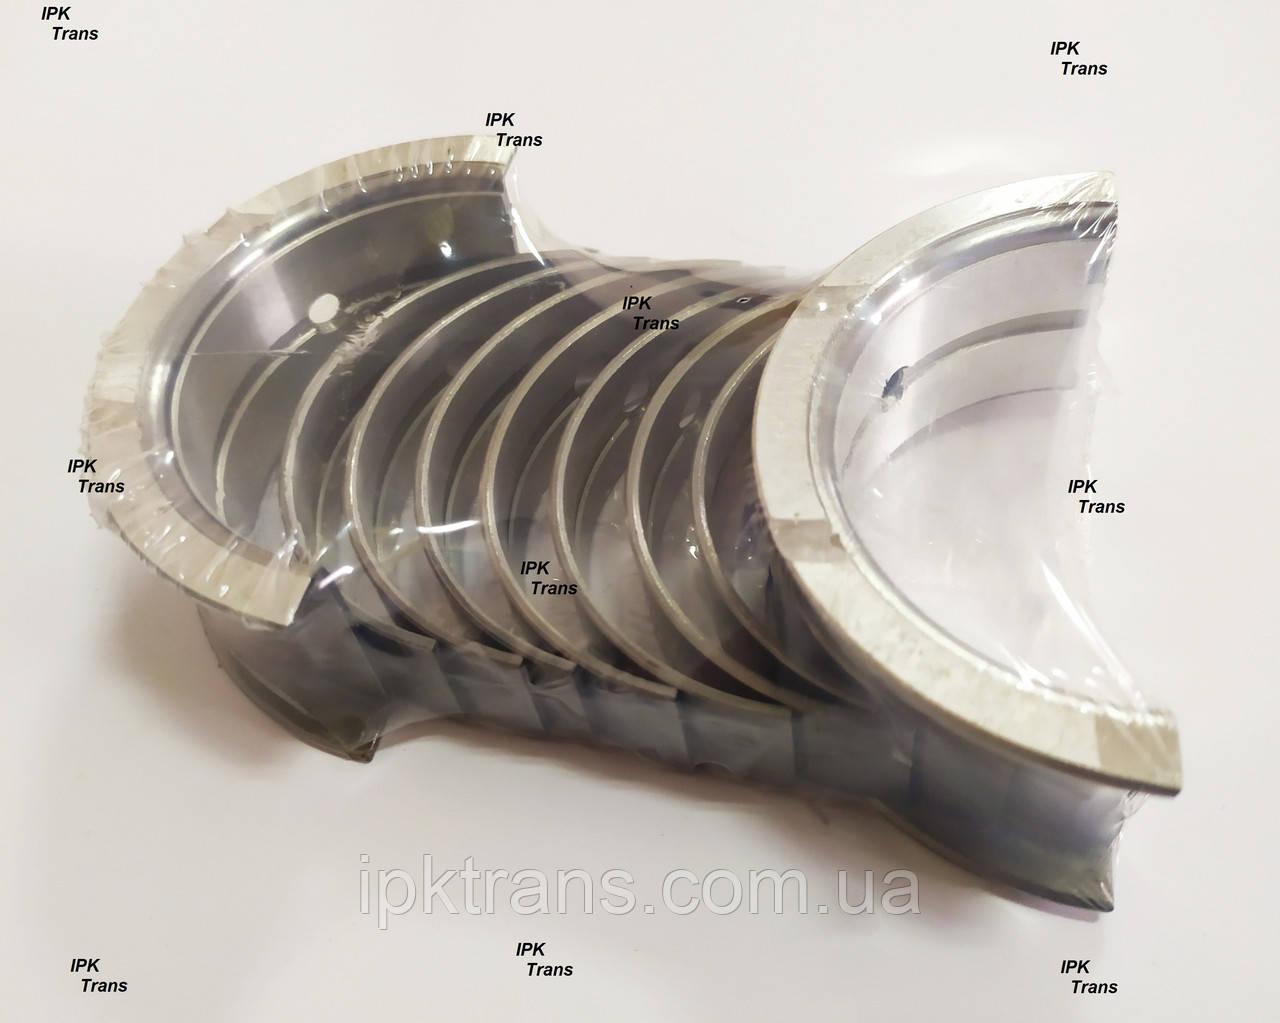 Вкладыши коренные на двигатель NISSAN H20 +0,25 (1014 грн) 12208-50K00 /1220850K00